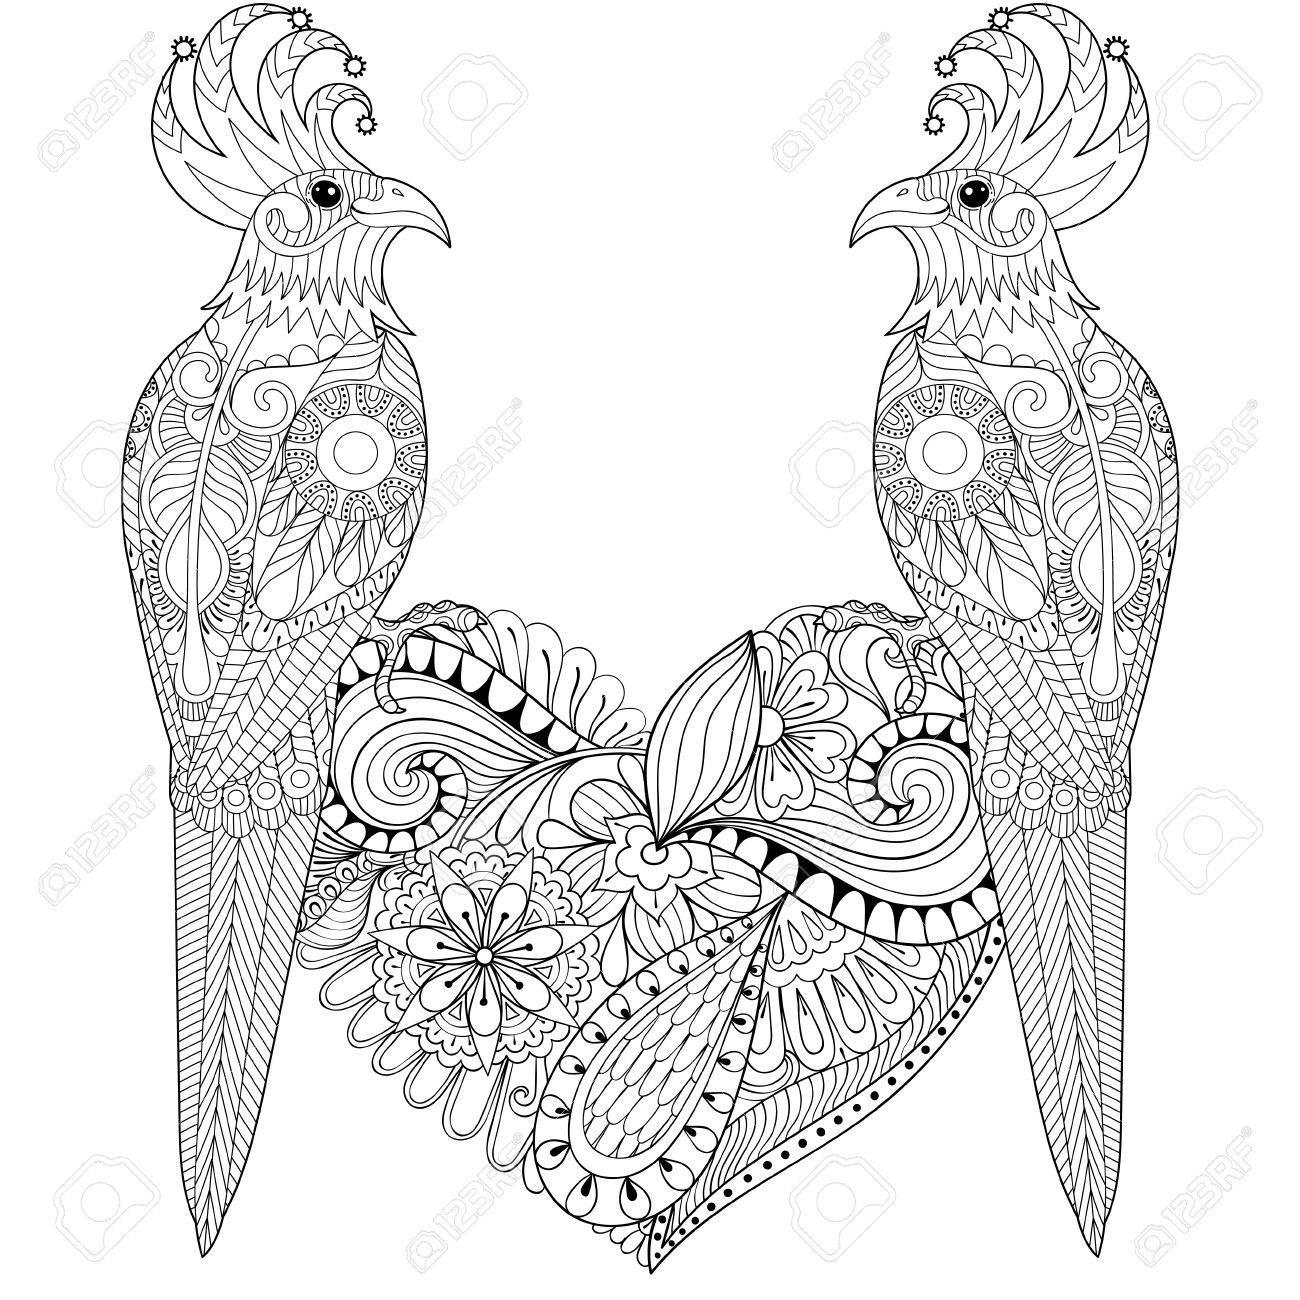 Exótico Pájaro Tropical Zentangle Encantadora Pareja De Adultos ...